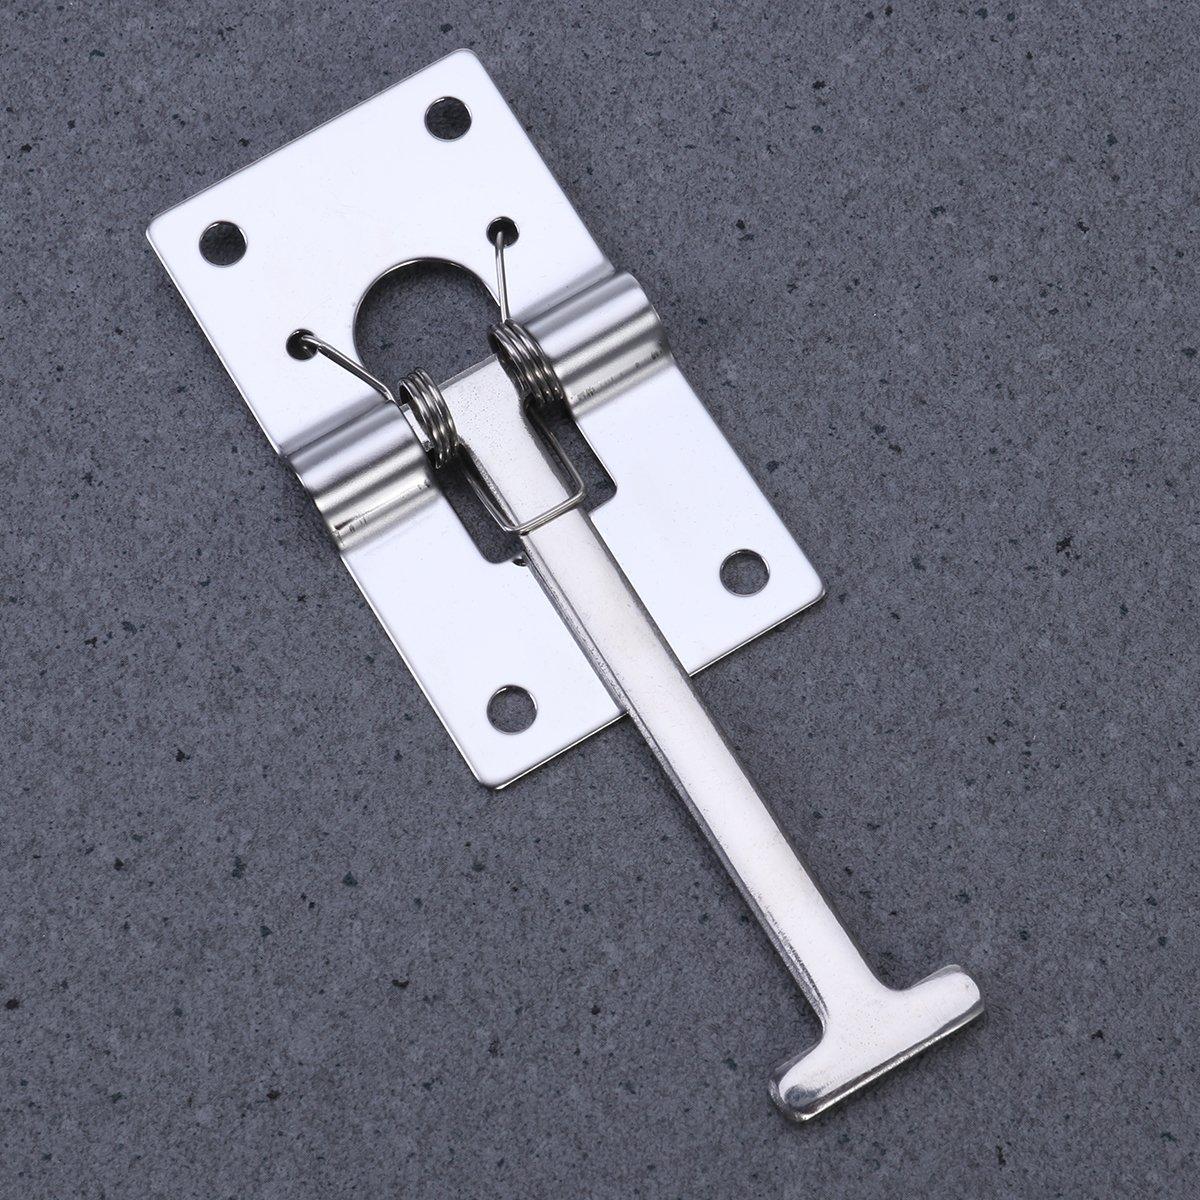 304 Stainless Steel WINOMO RV Trailer Door Holder T-Style Entry Door Catch Holder for RV Camper Trailer